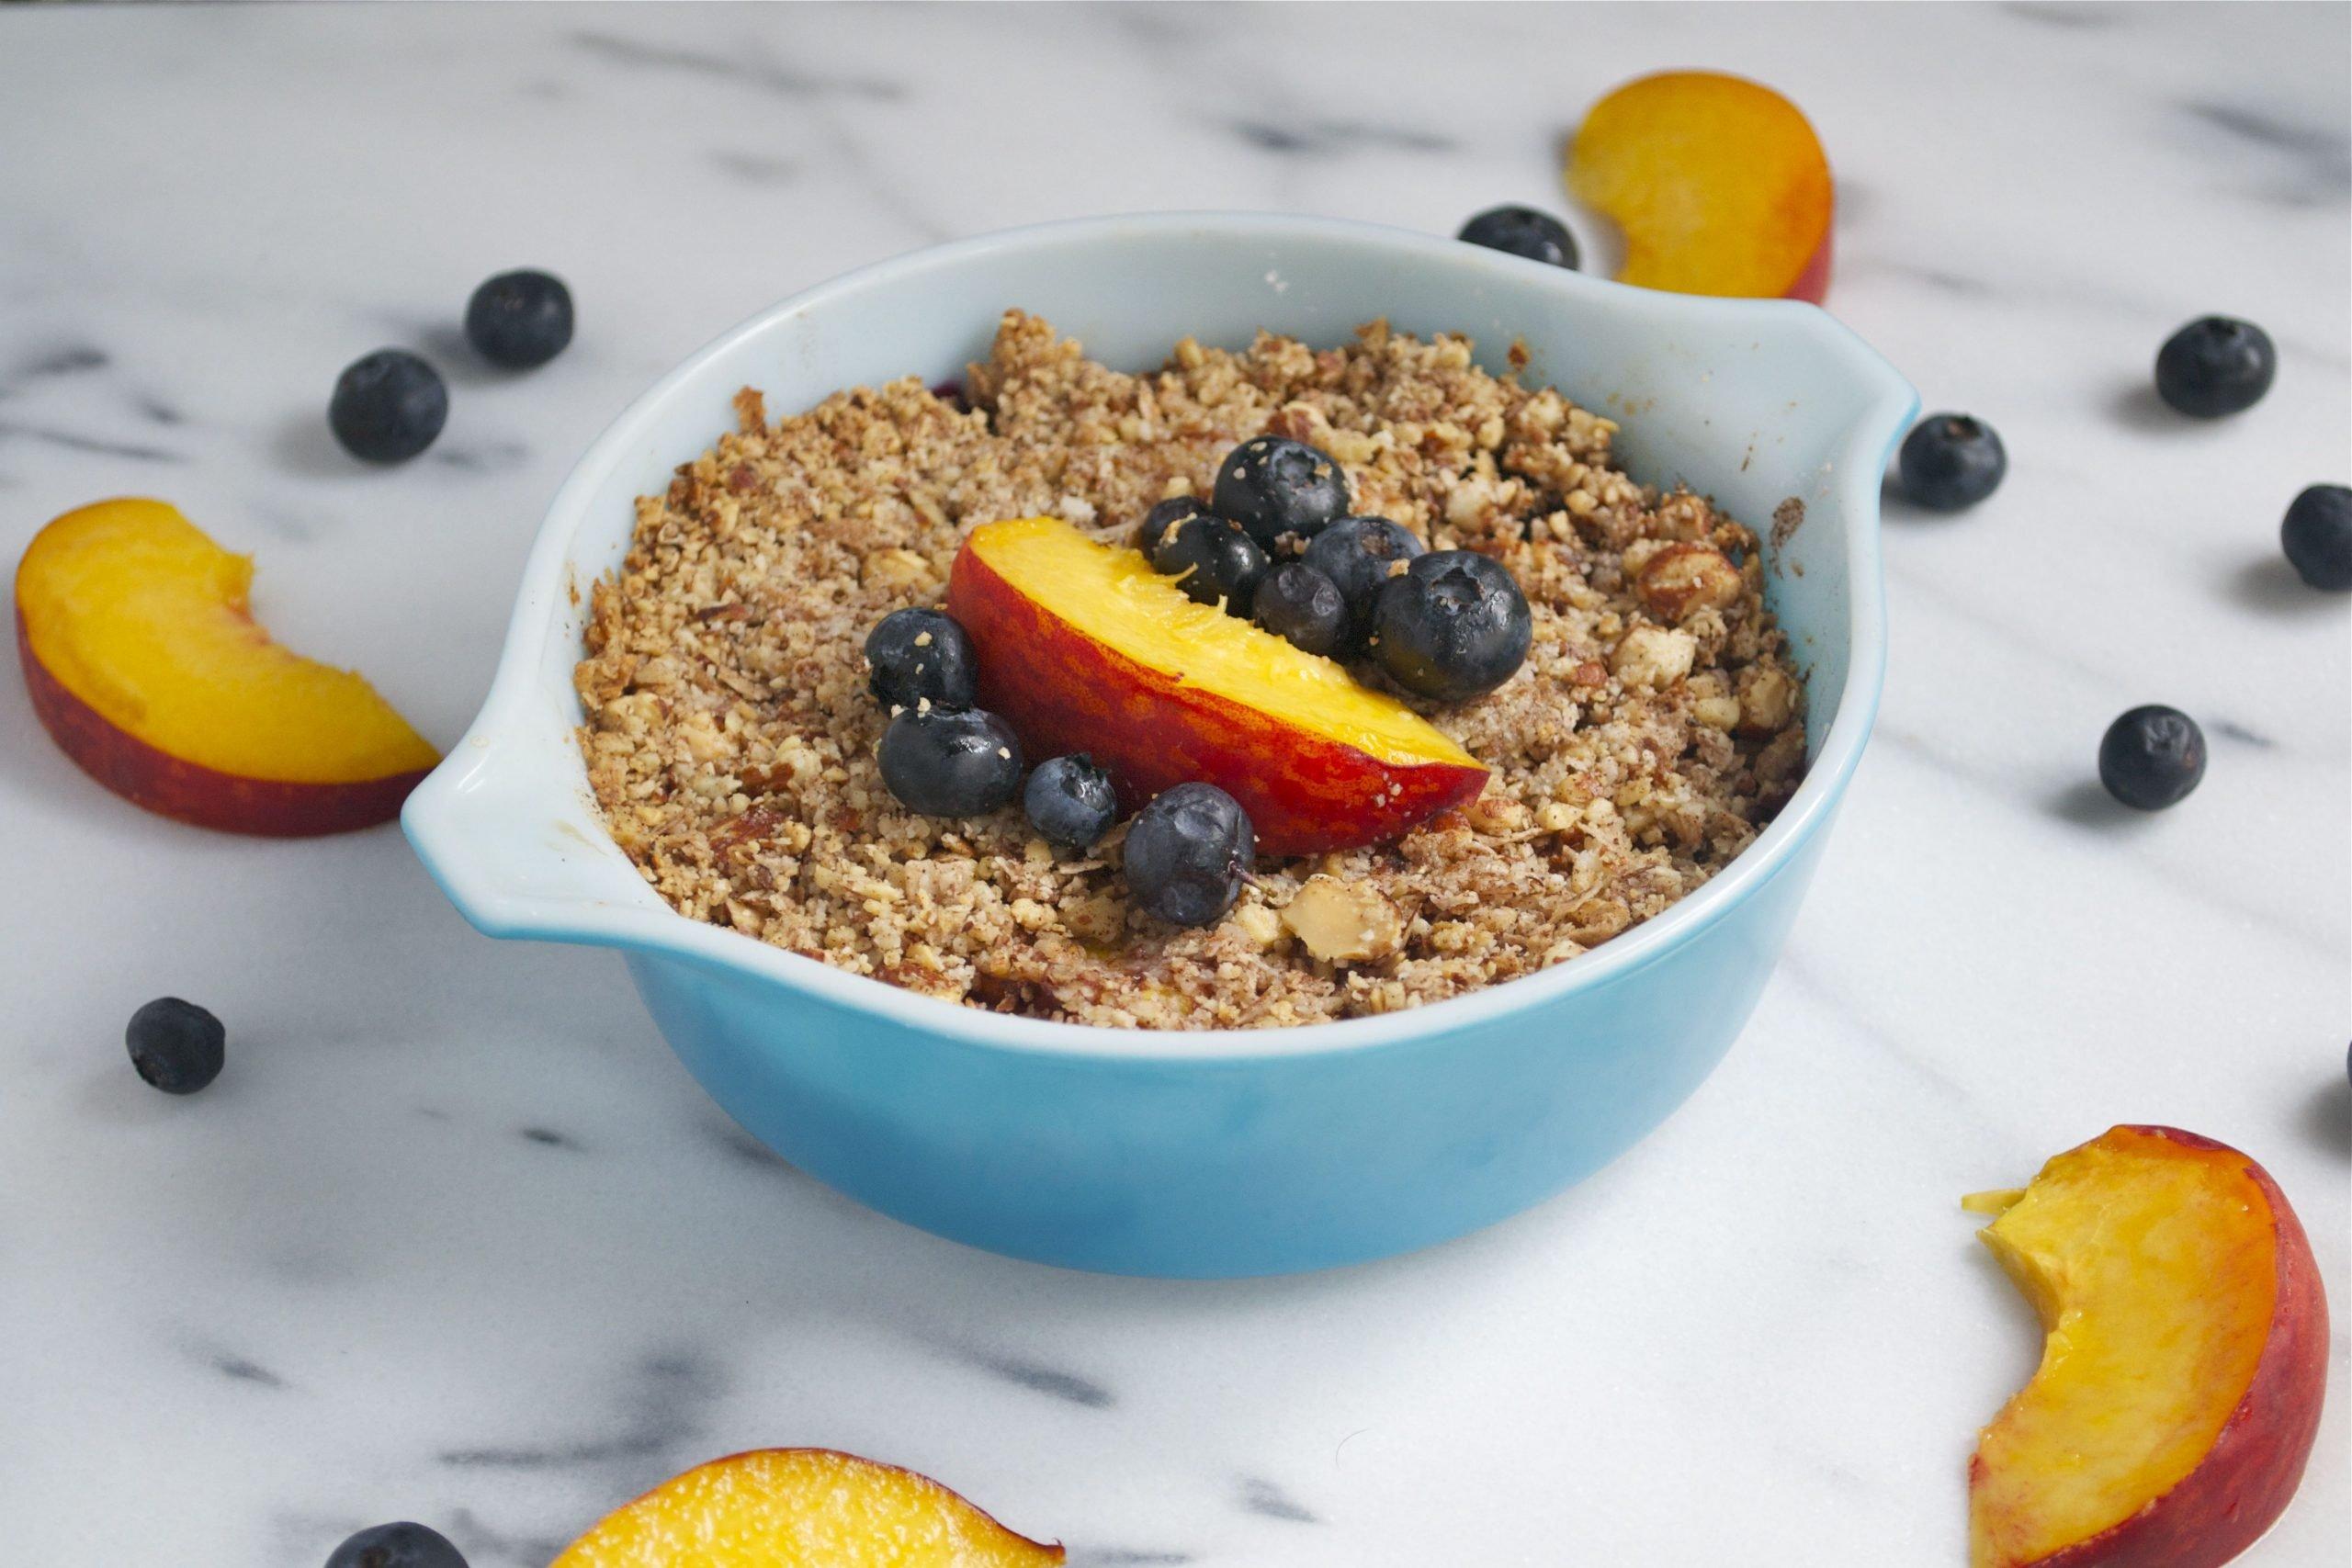 Peach Blueberry Crisp - {gluten-free, dairy-free, refined sugar-free, vegan, grain-free} - A Dash of Megnut